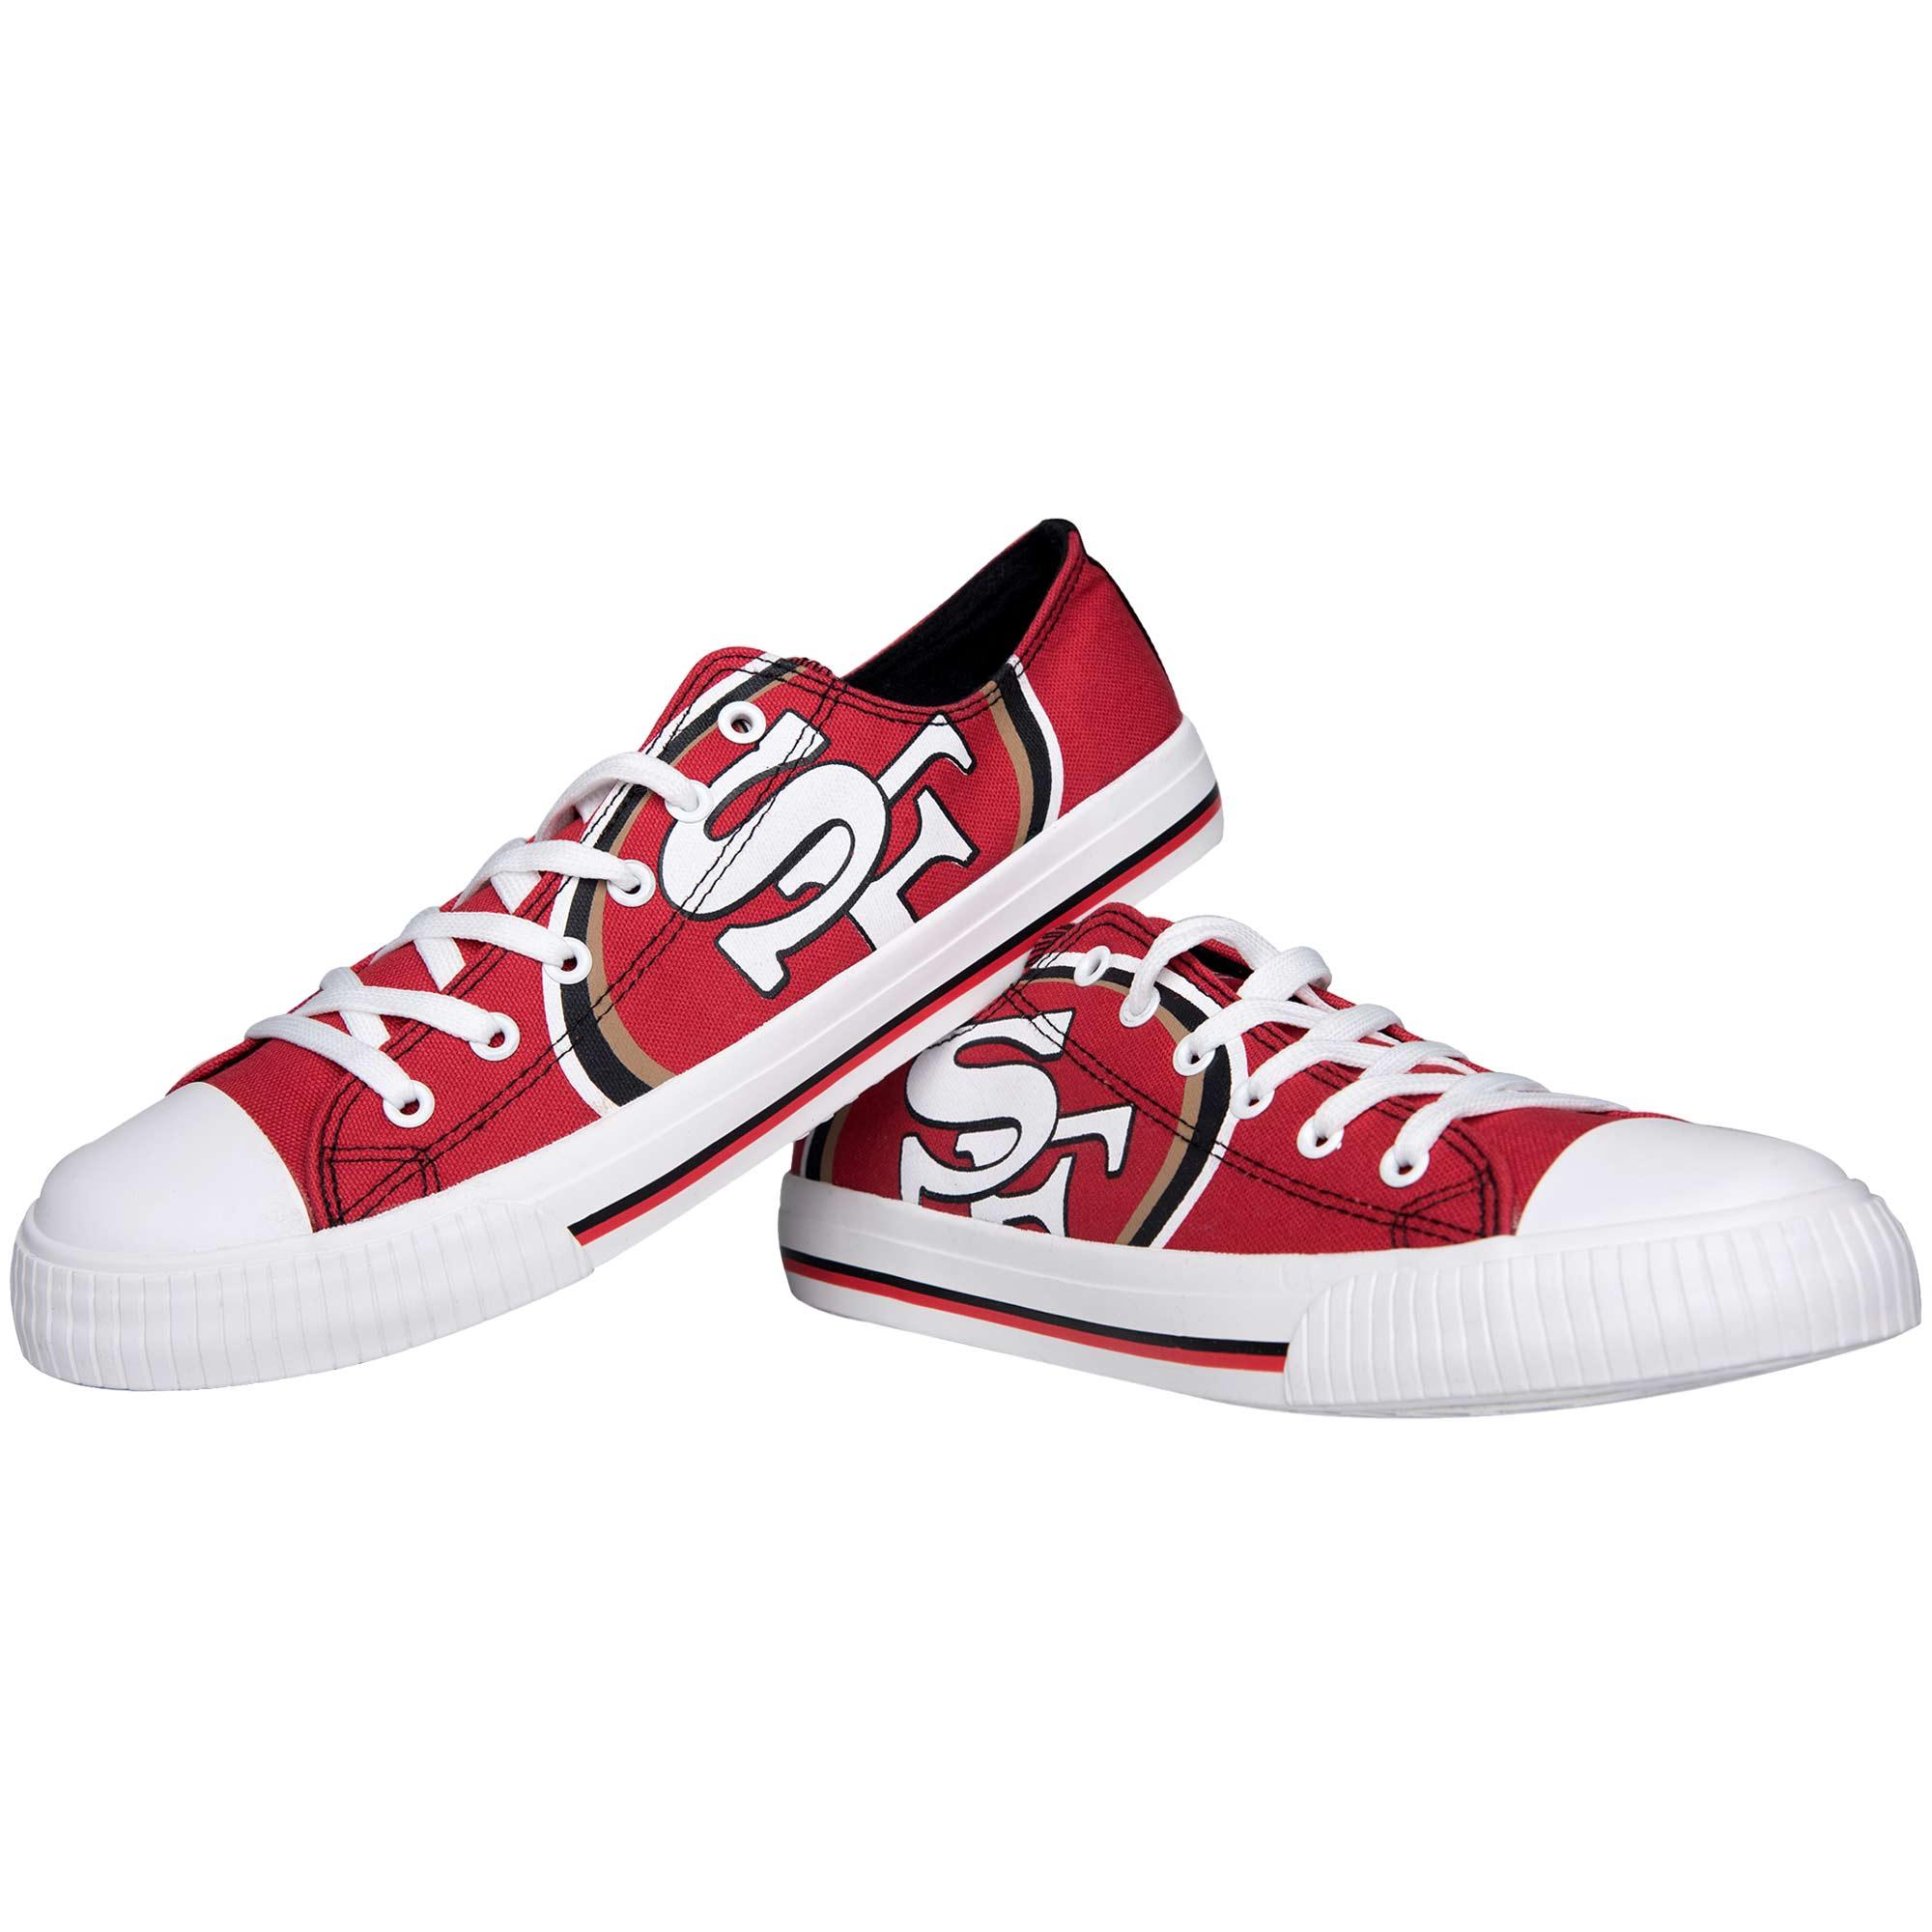 San Francisco 49ers Big Logo Low Top Sneakers